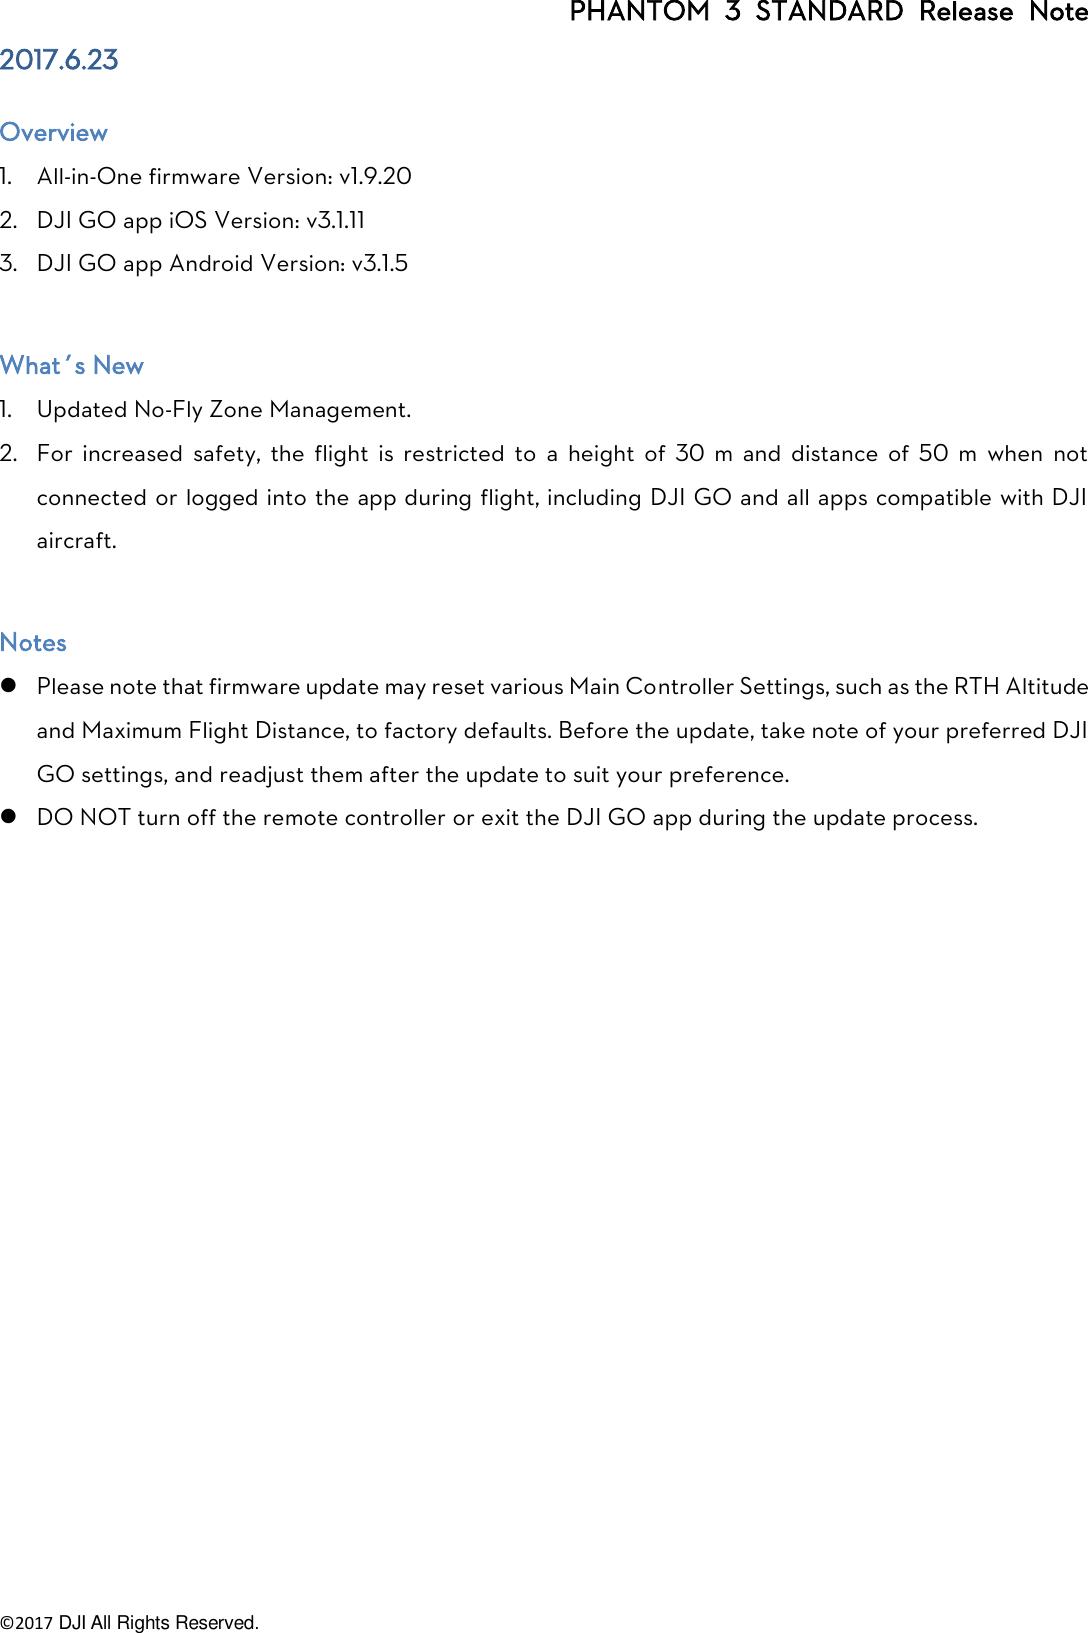 DJI Phantom 3 Standard Specs, FAQ, Manual, Video Tutorials And GO